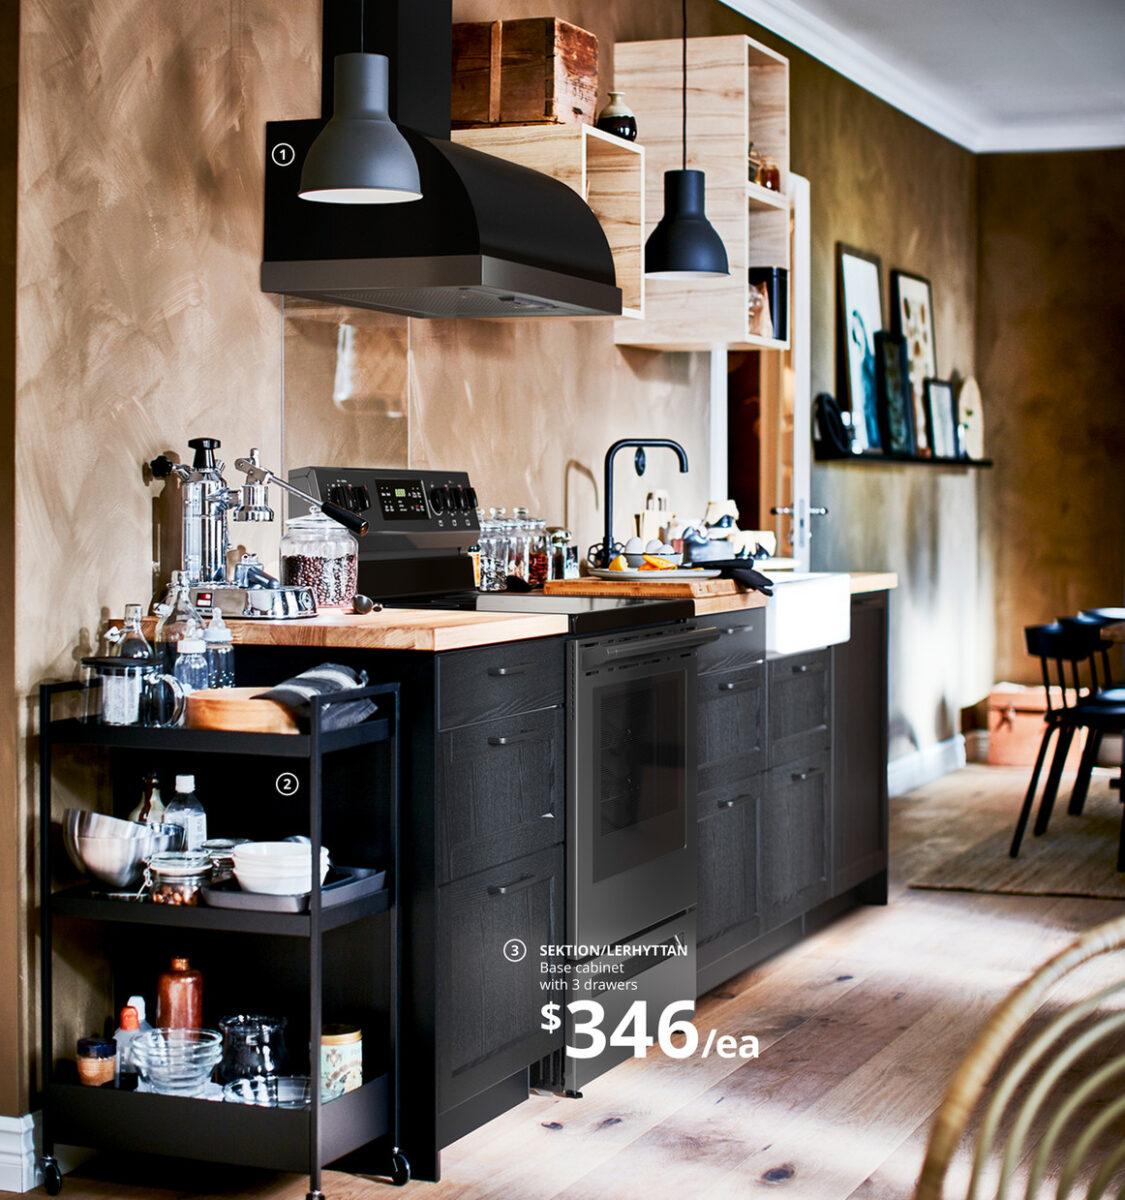 ikea-cucine-catalogo-2021 (3)